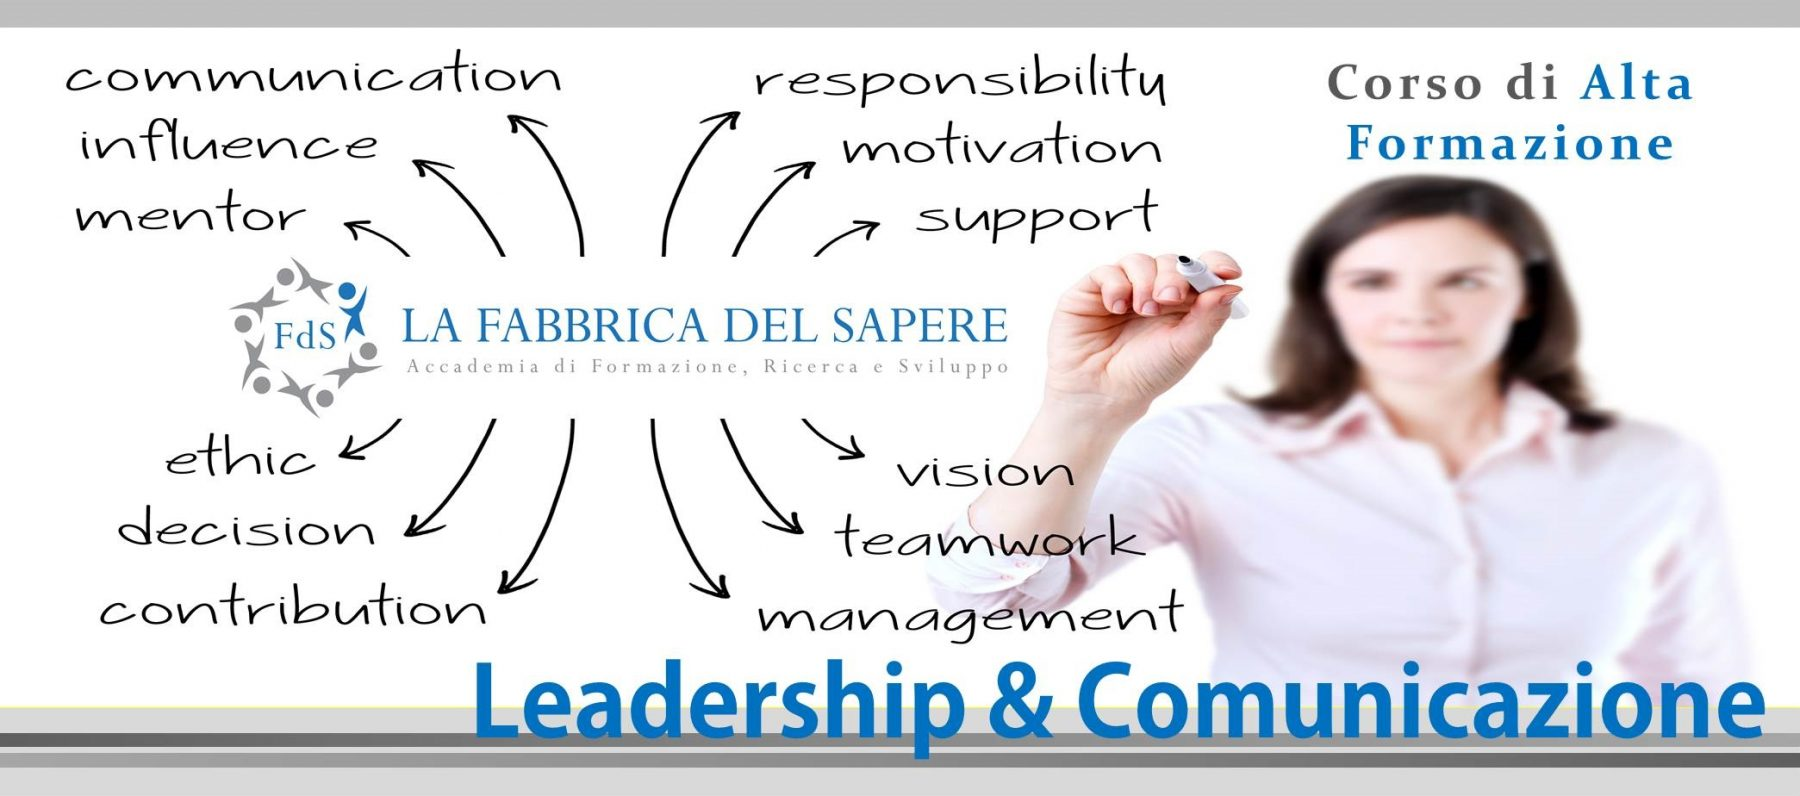 leadershipecomunicazione